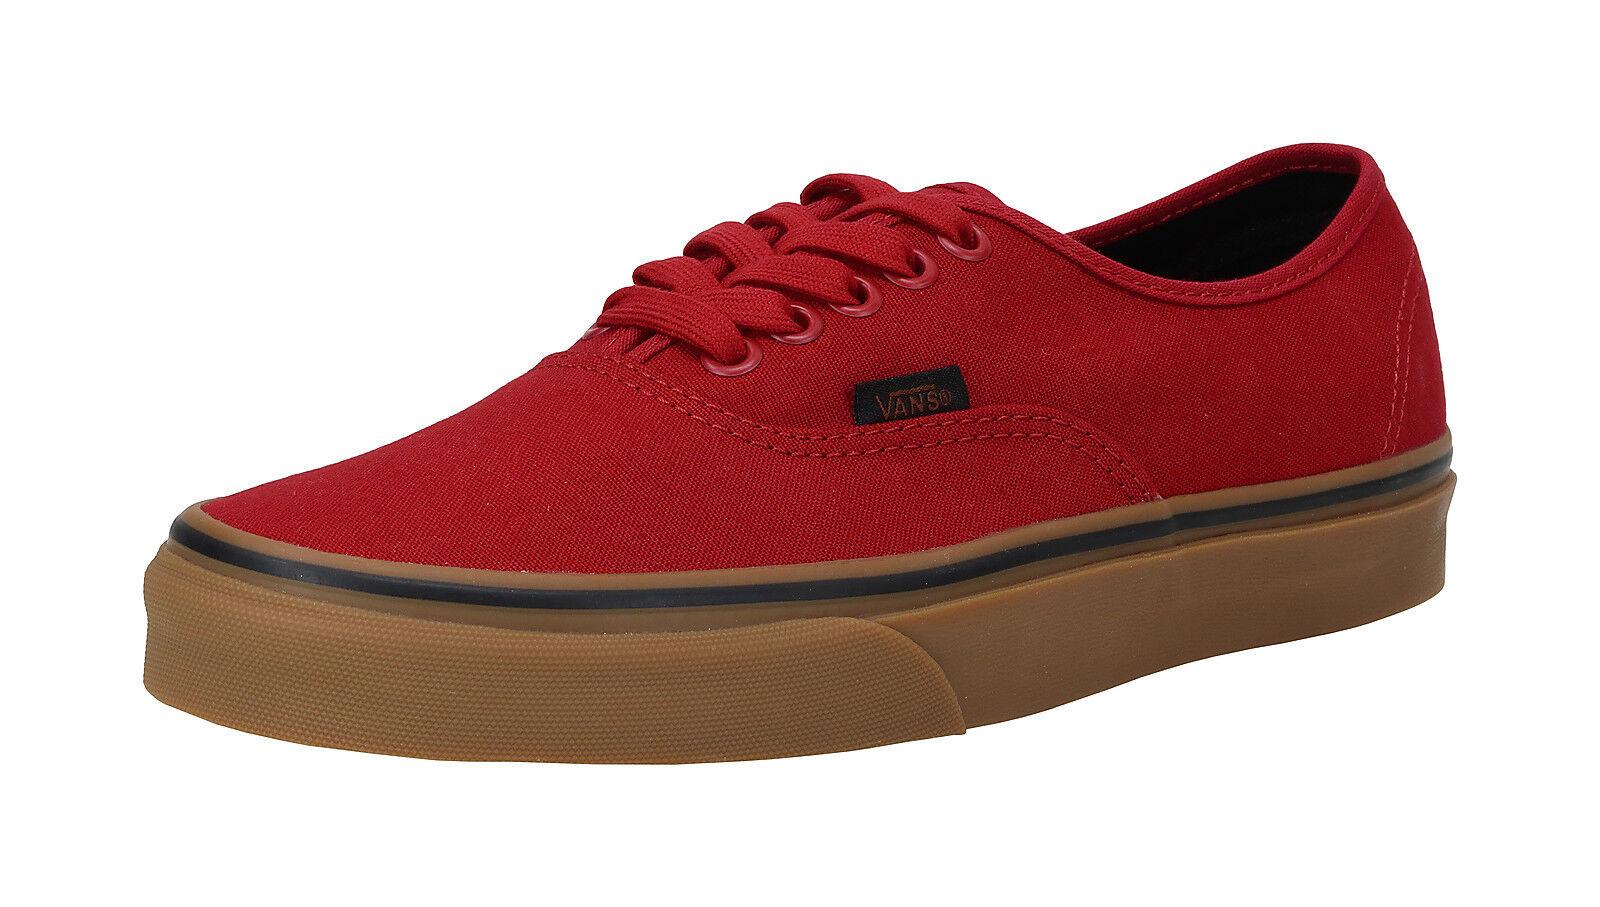 c4544b99f4 VANS Authentic Mens Gum Racing Red Black Canvas Skate Boat Shoes ...